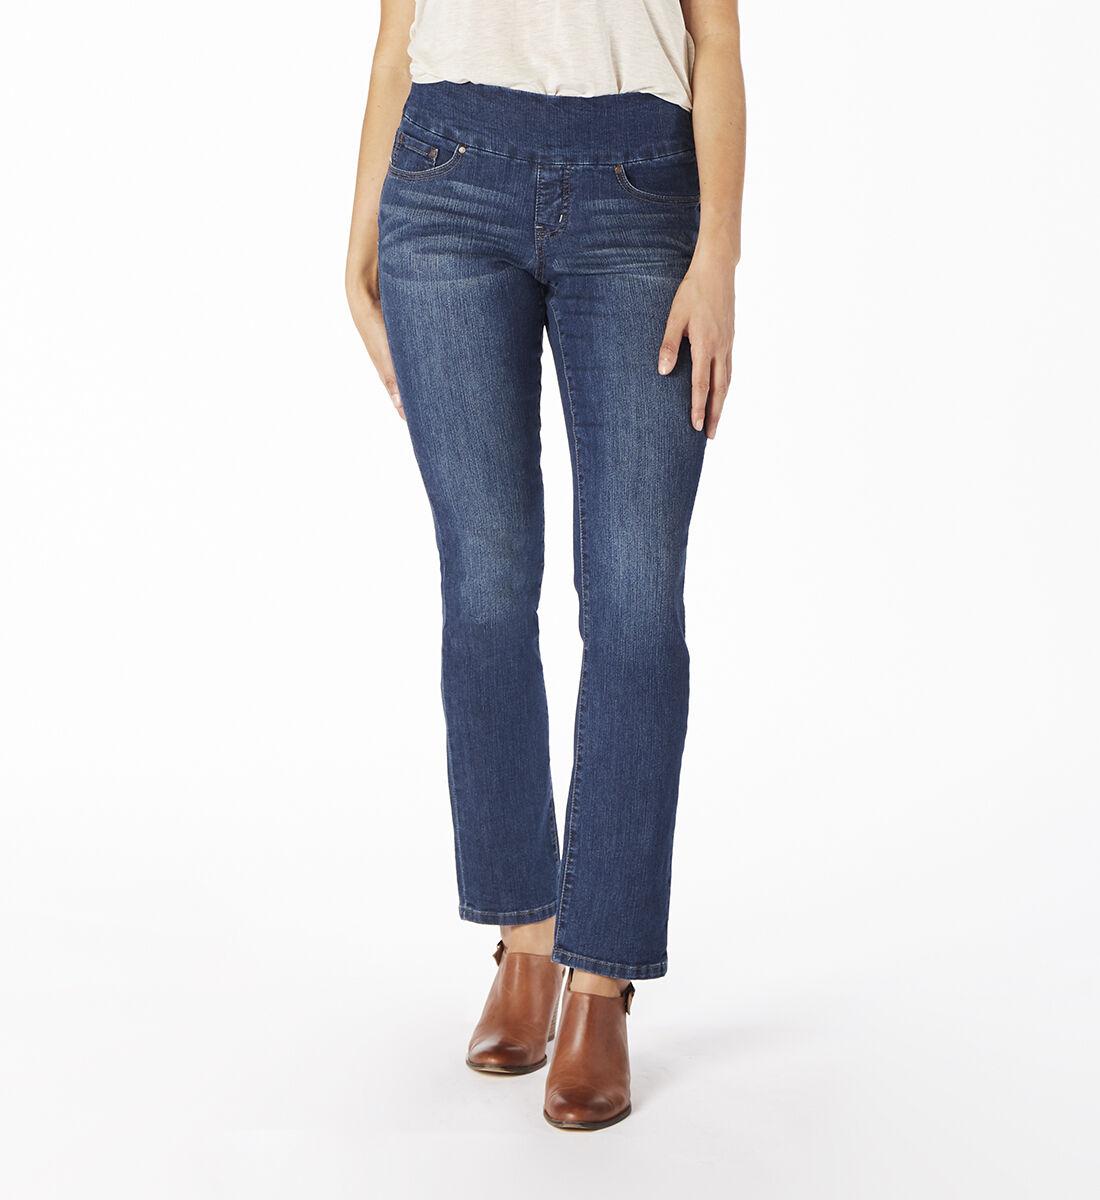 Jag jeans petite peri straight also women   clothing petites rh jagjeans